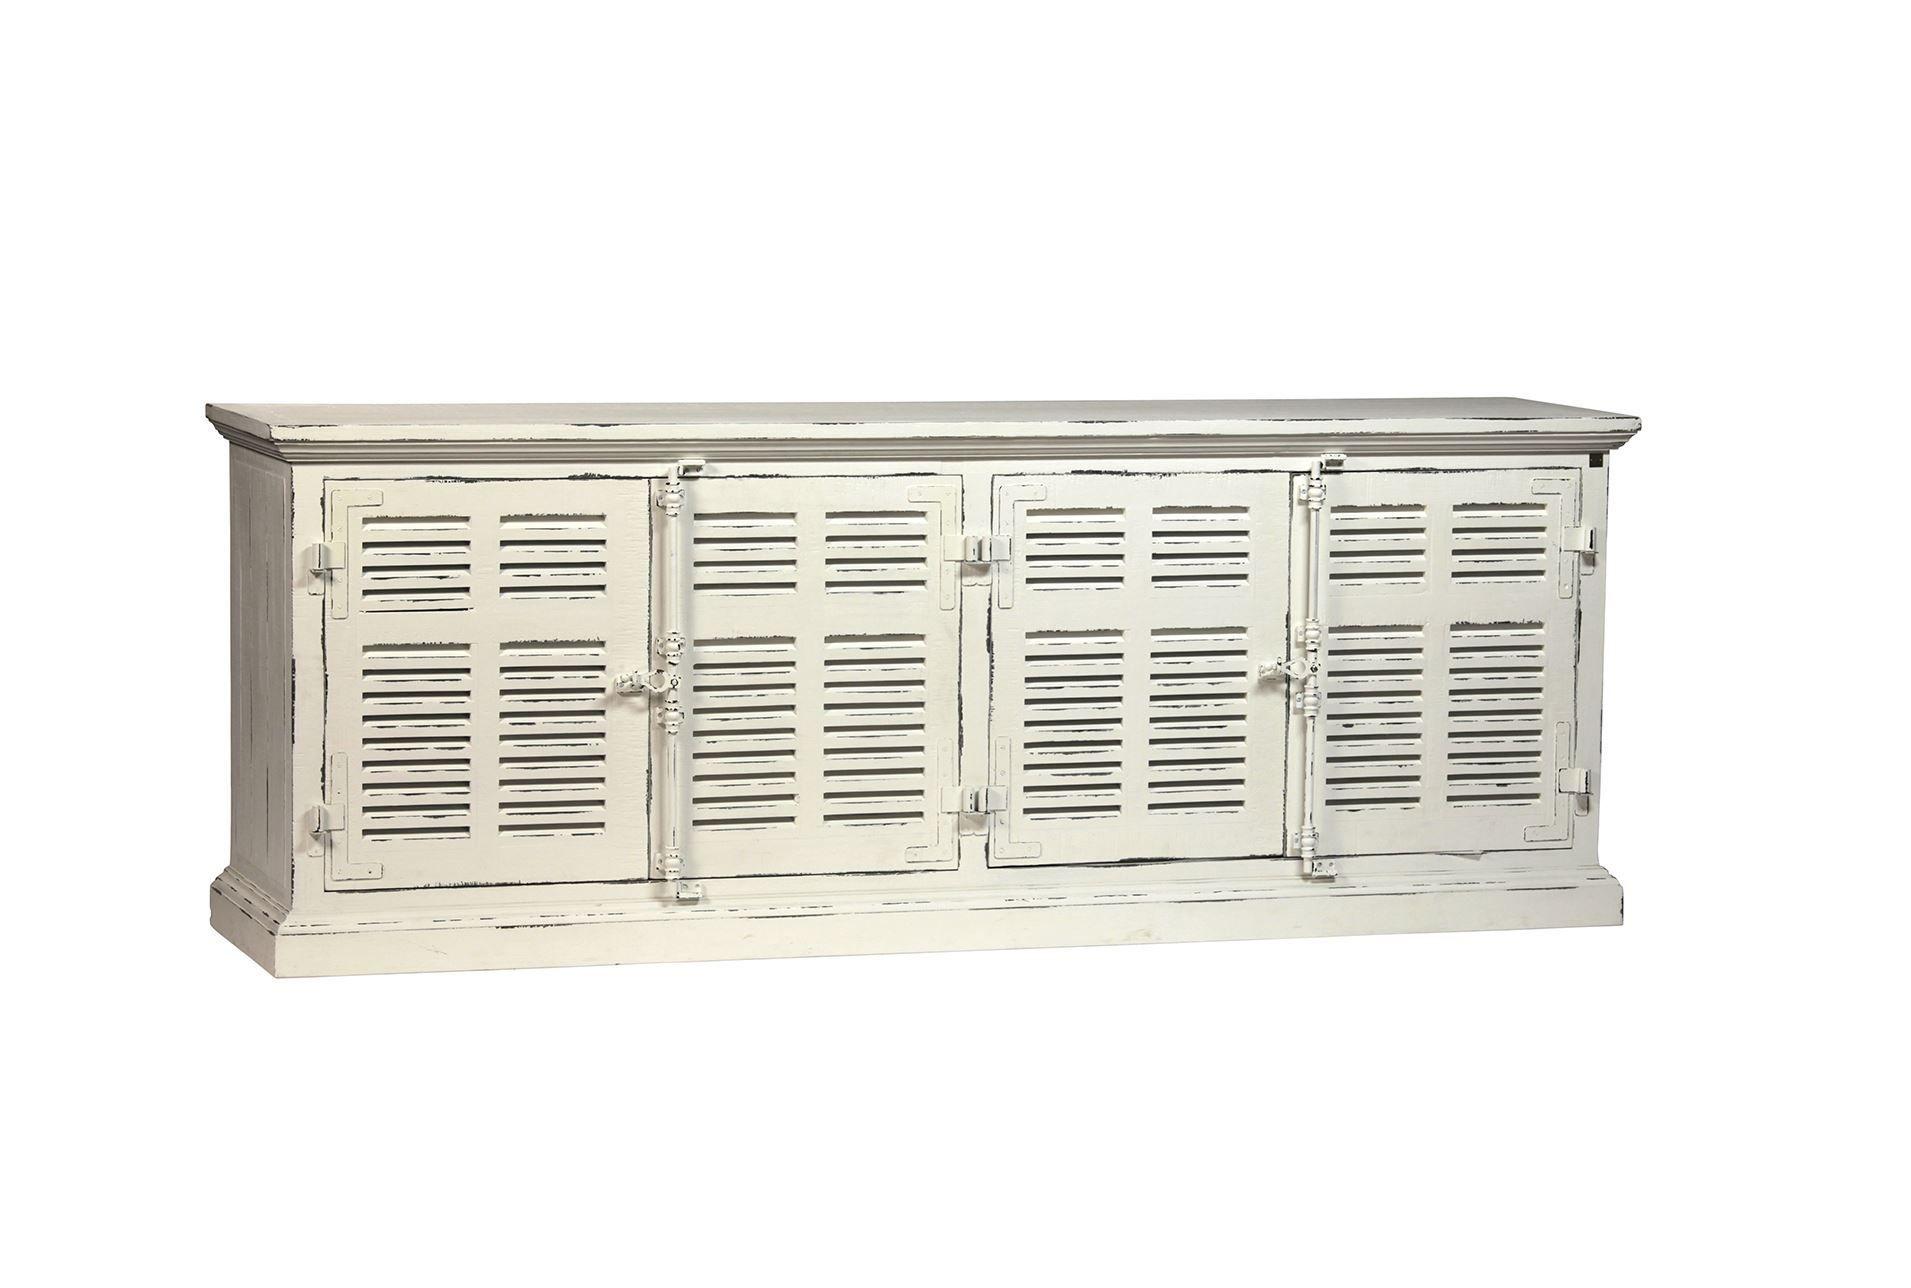 Otb Frozen White Finish Sideboard - Signature | Furniture | Pinterest regarding Burn Tan Finish 2-Door Sideboards (Image 19 of 30)